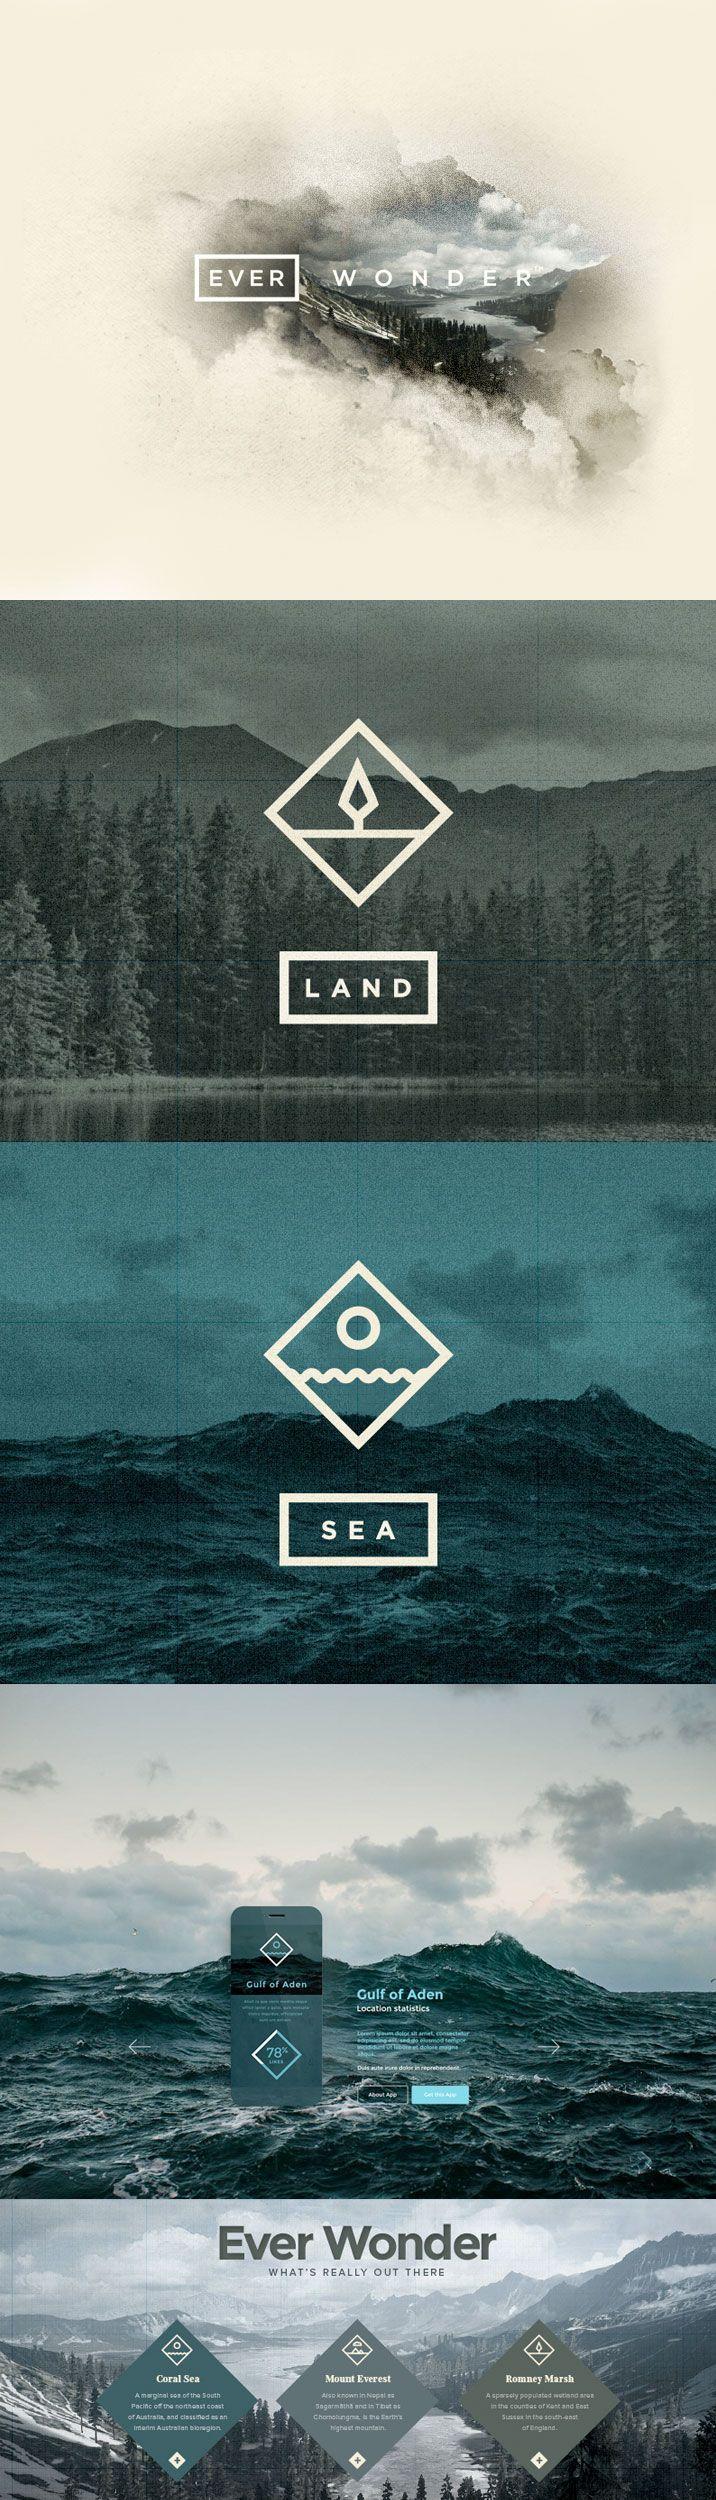 Unique design ideas: Fall in love with this graphic design | www.delightfull.eu/blog #GraphicDesign